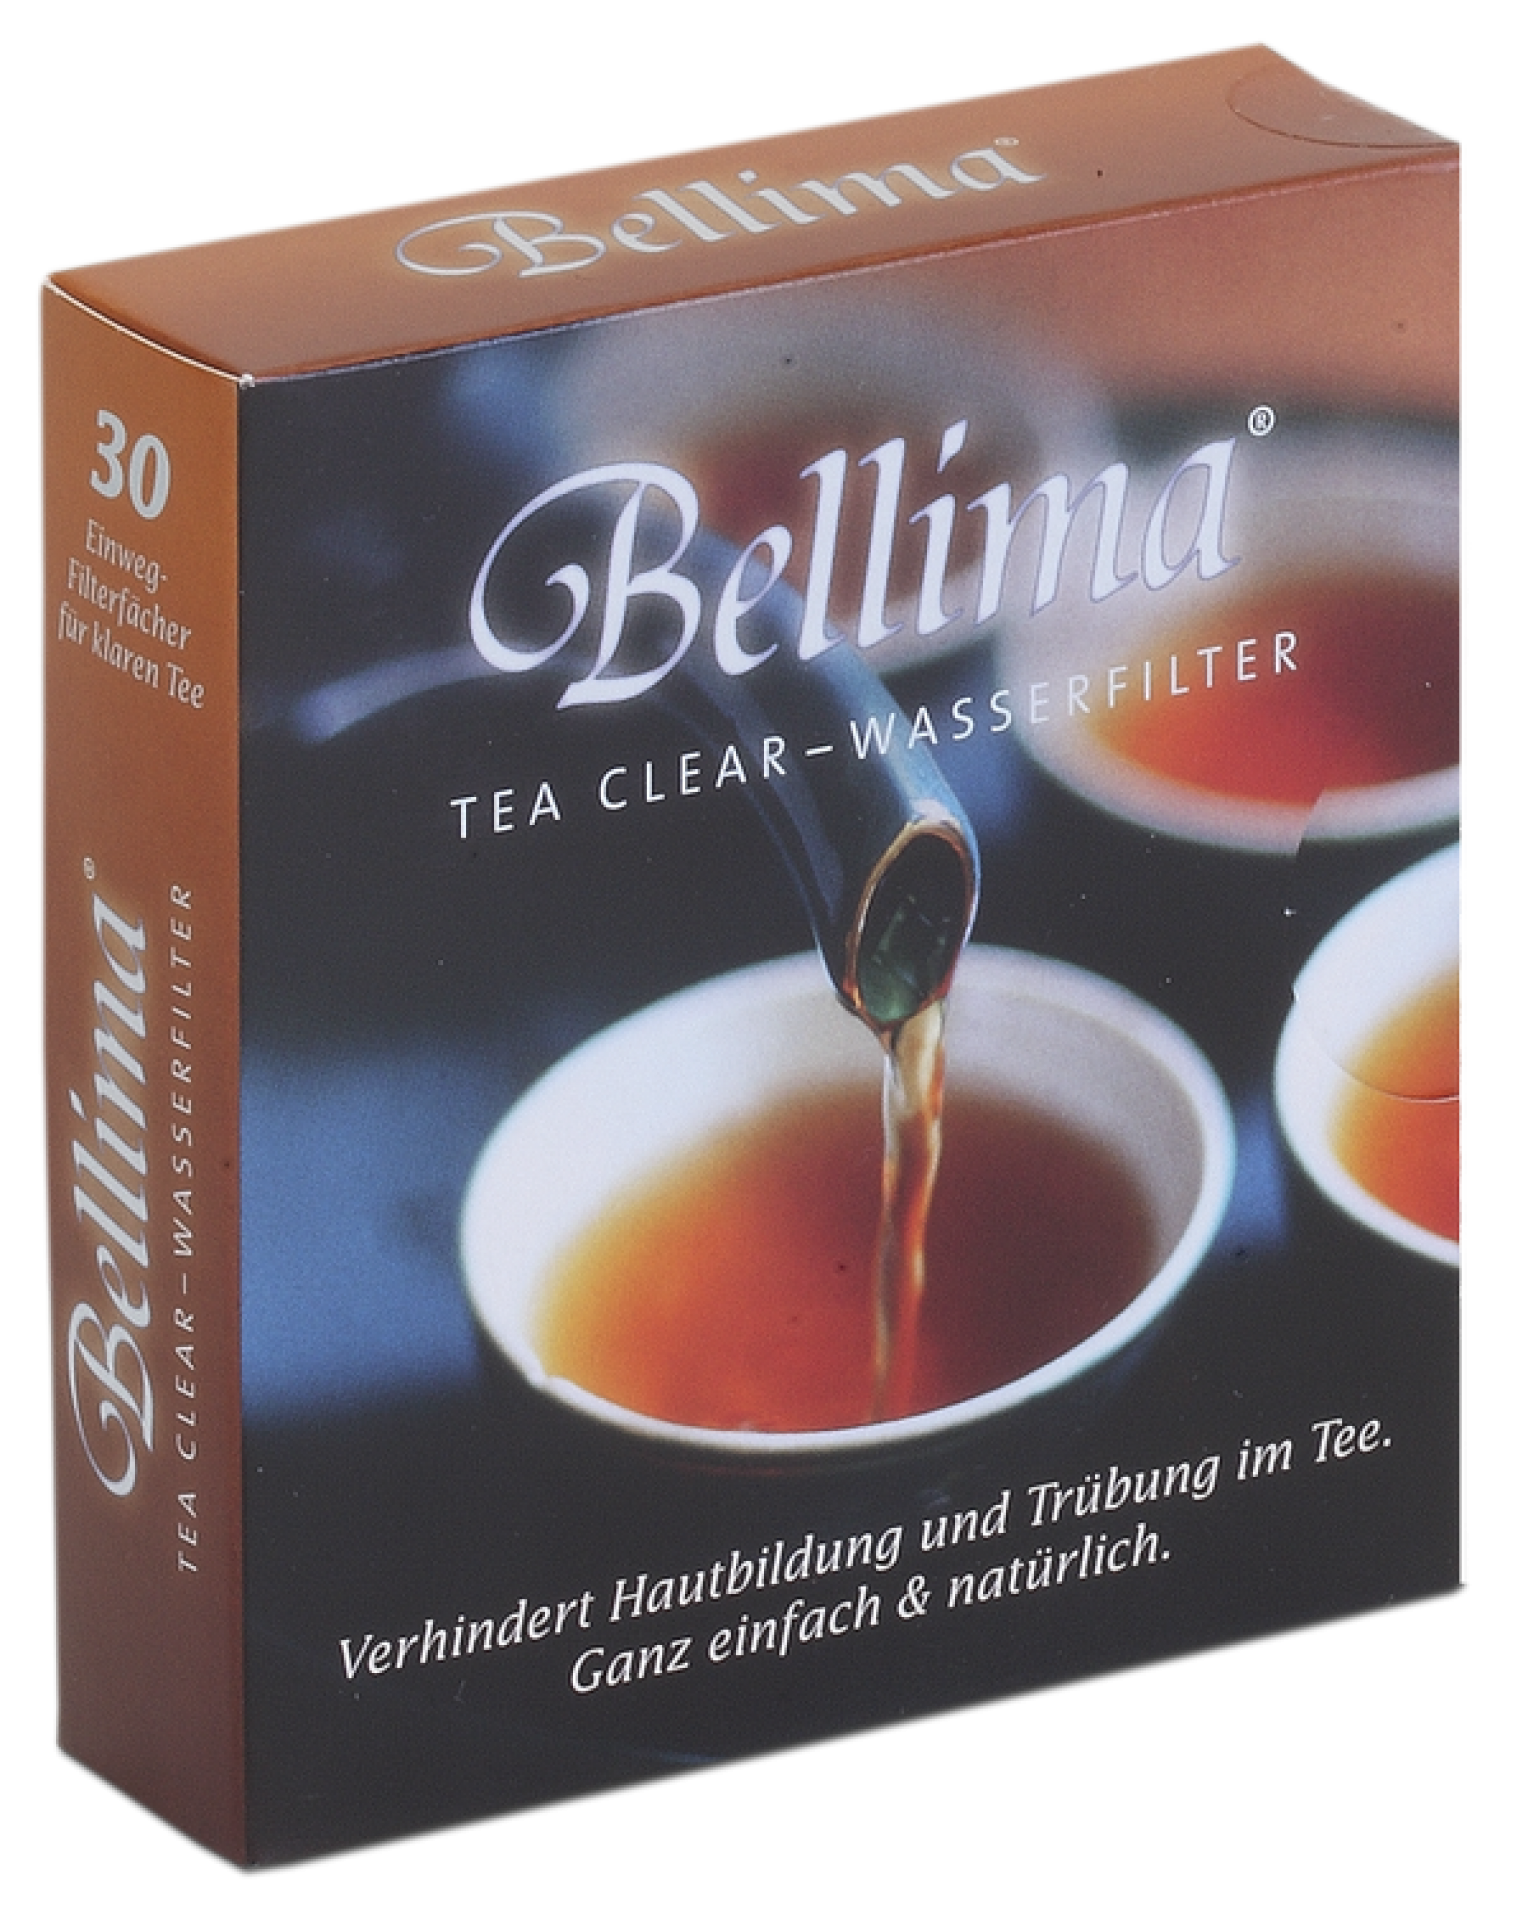 Bellima Wasserfilter 30 Stück